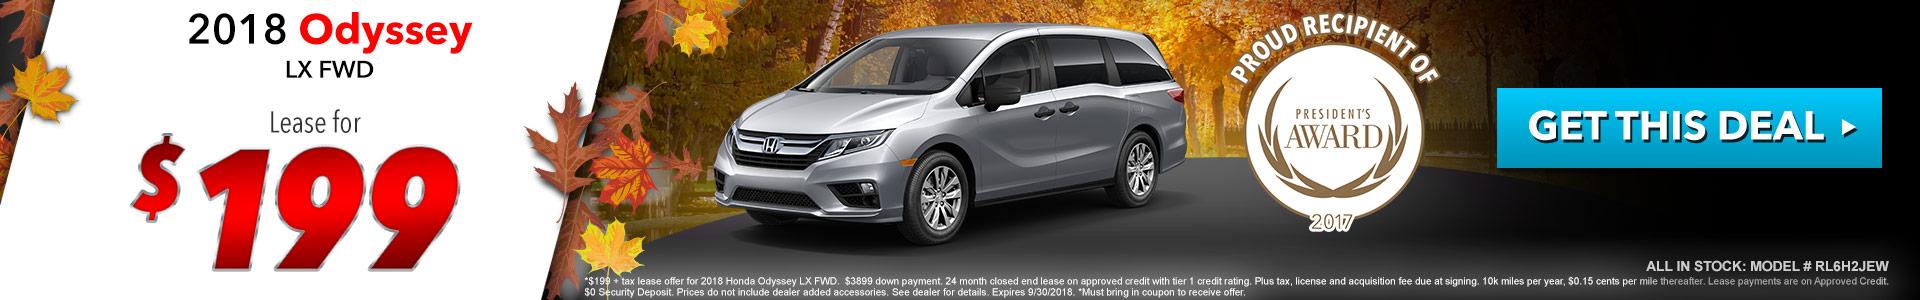 Honda Odyssey $199 Lease